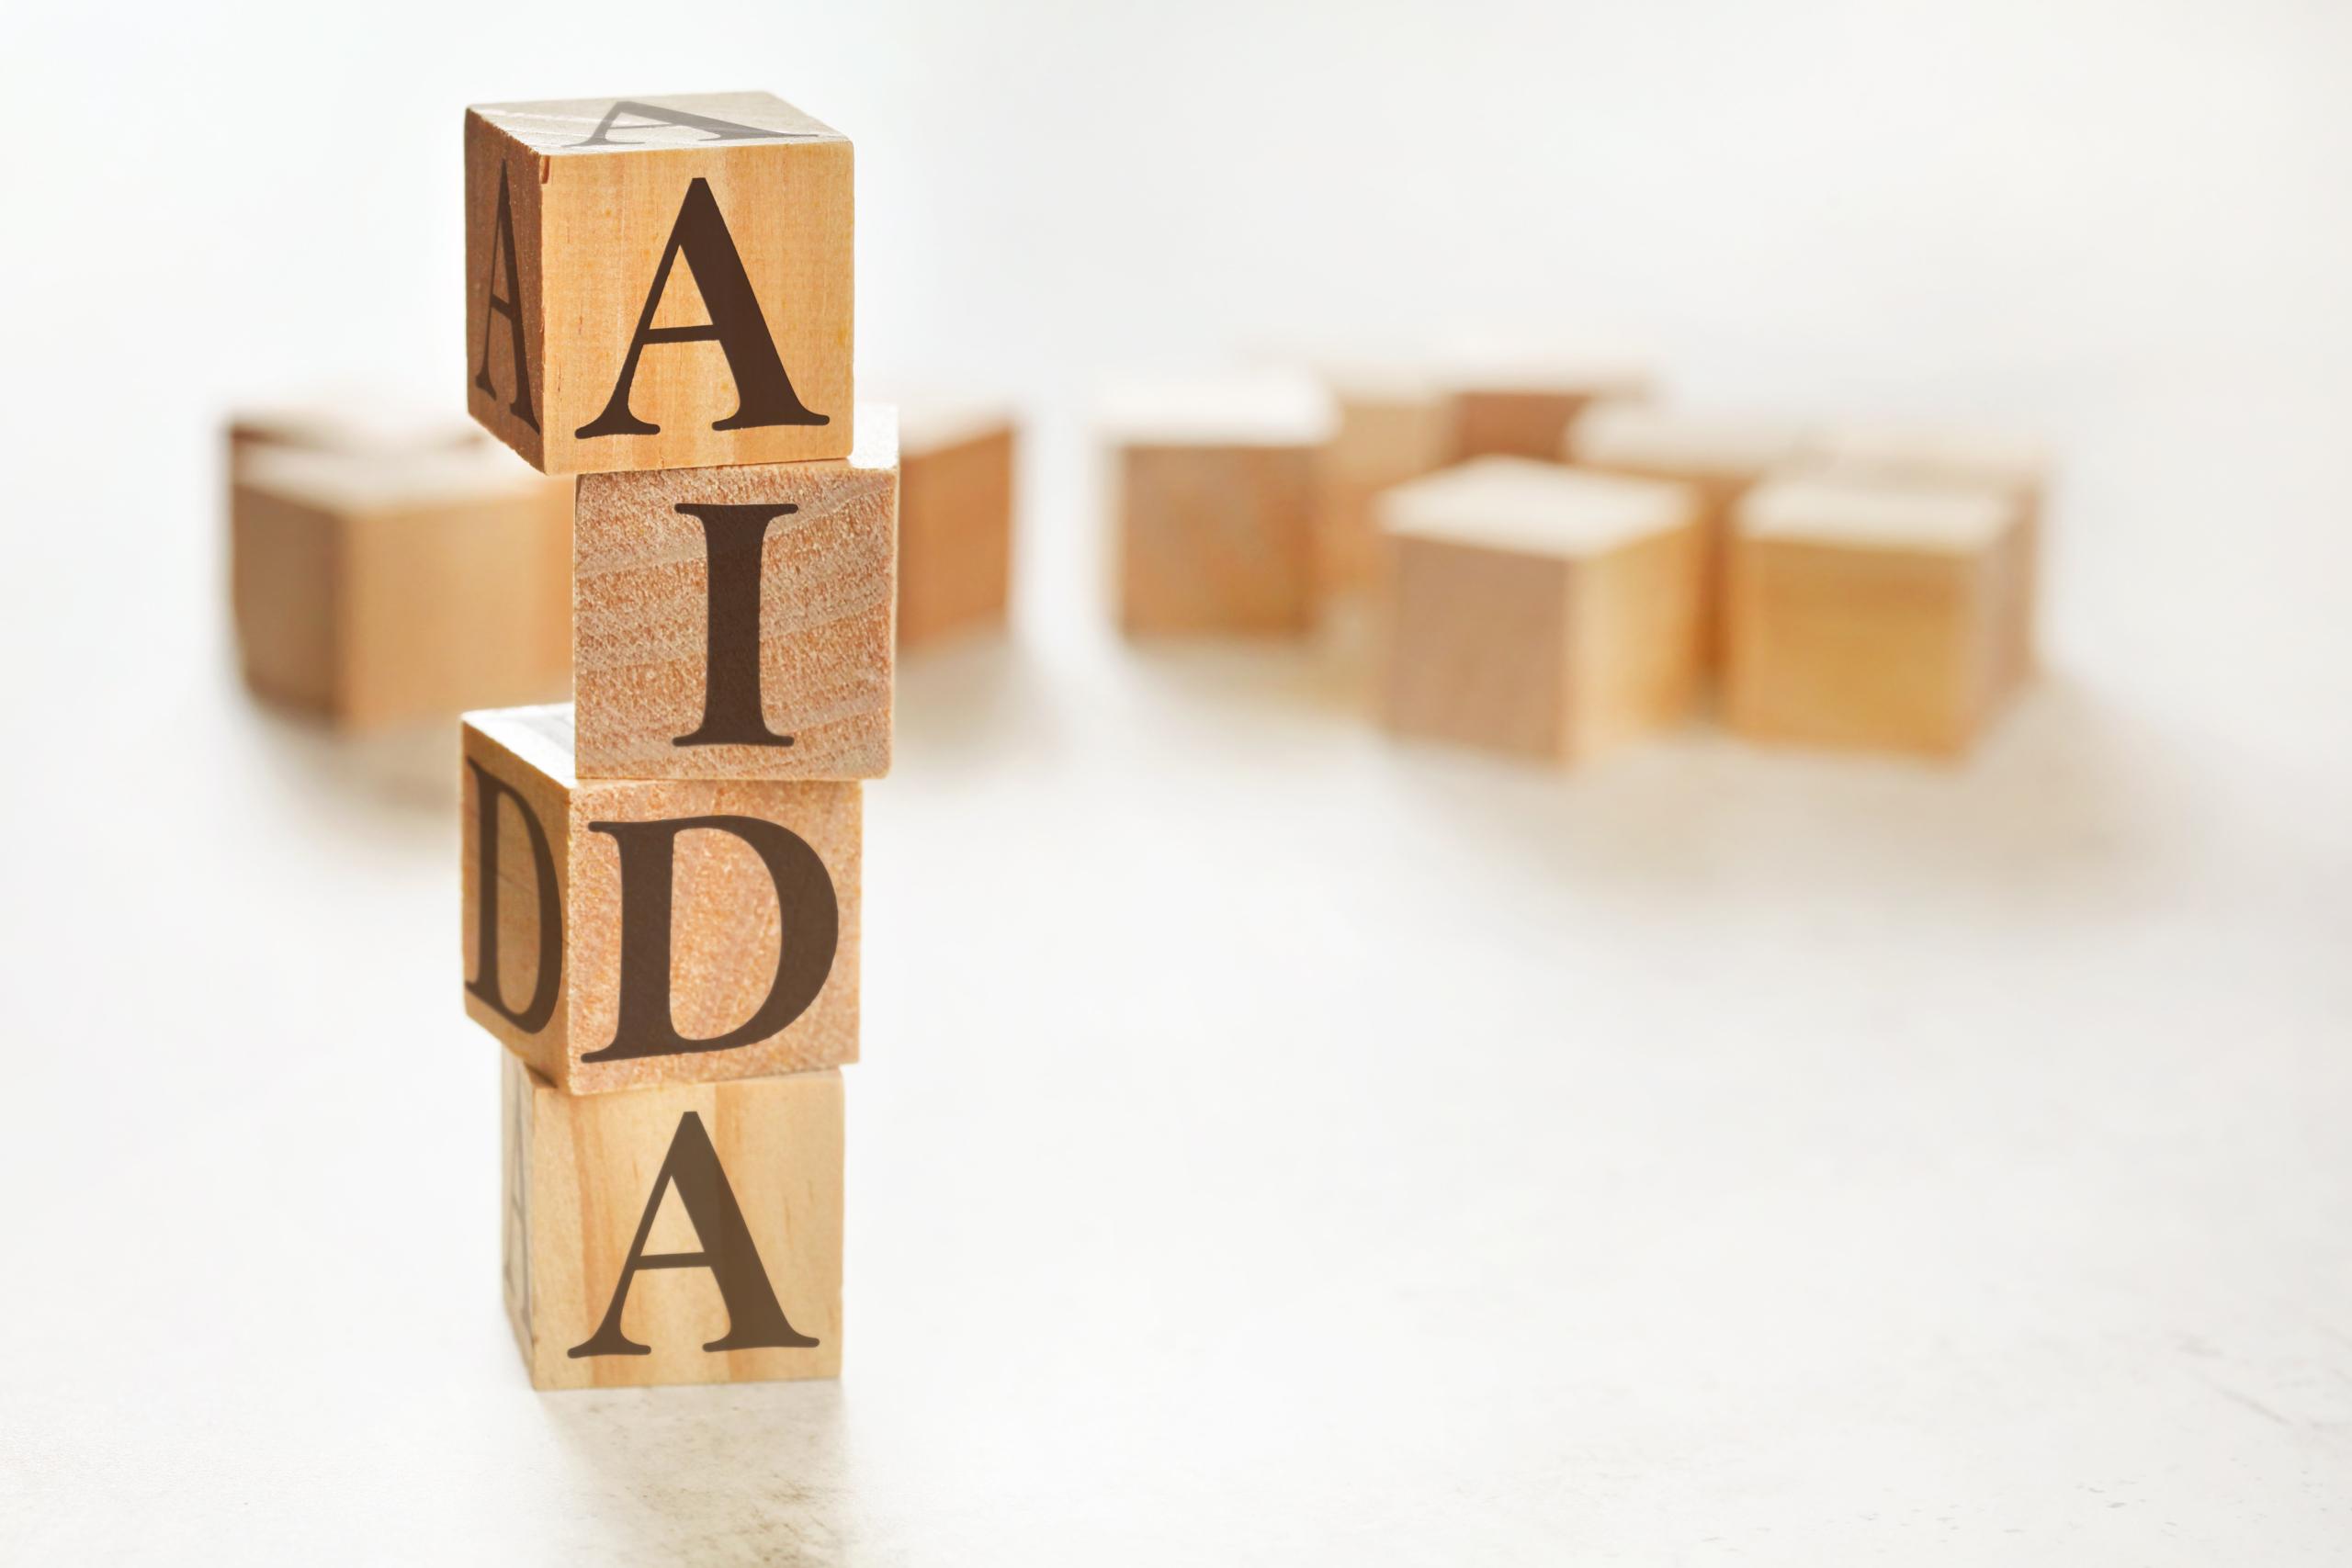 the AIDA model